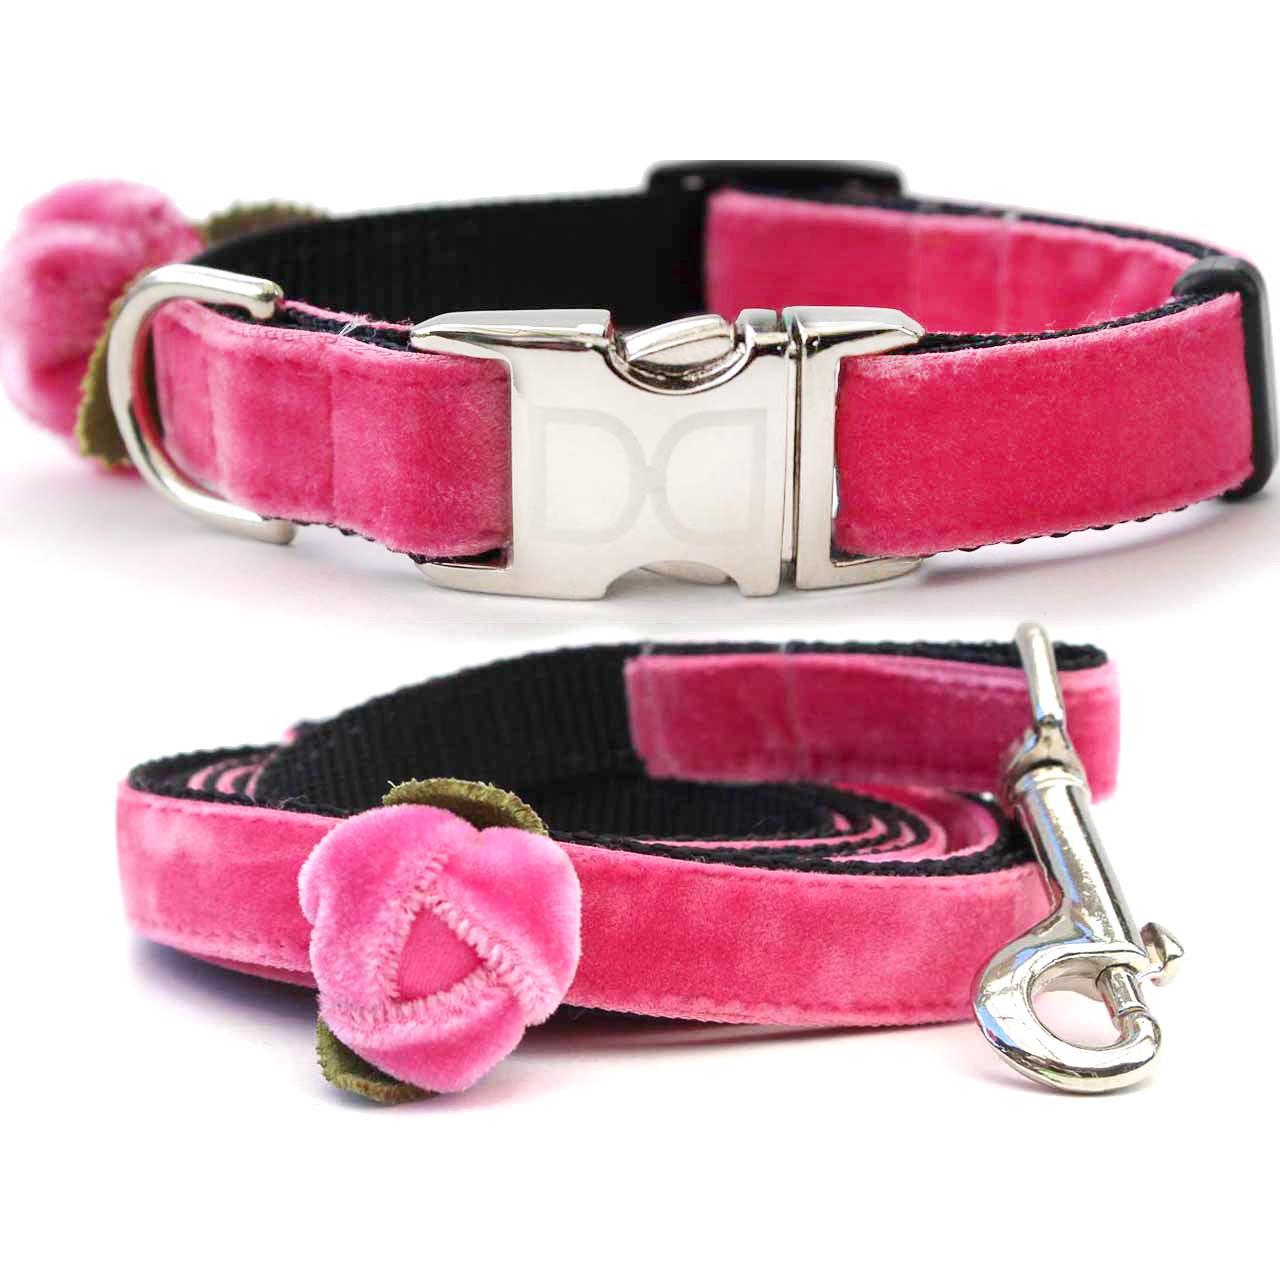 Rosebud Pink Velvet Small Dog Collar and Leash Set by Diva Dog